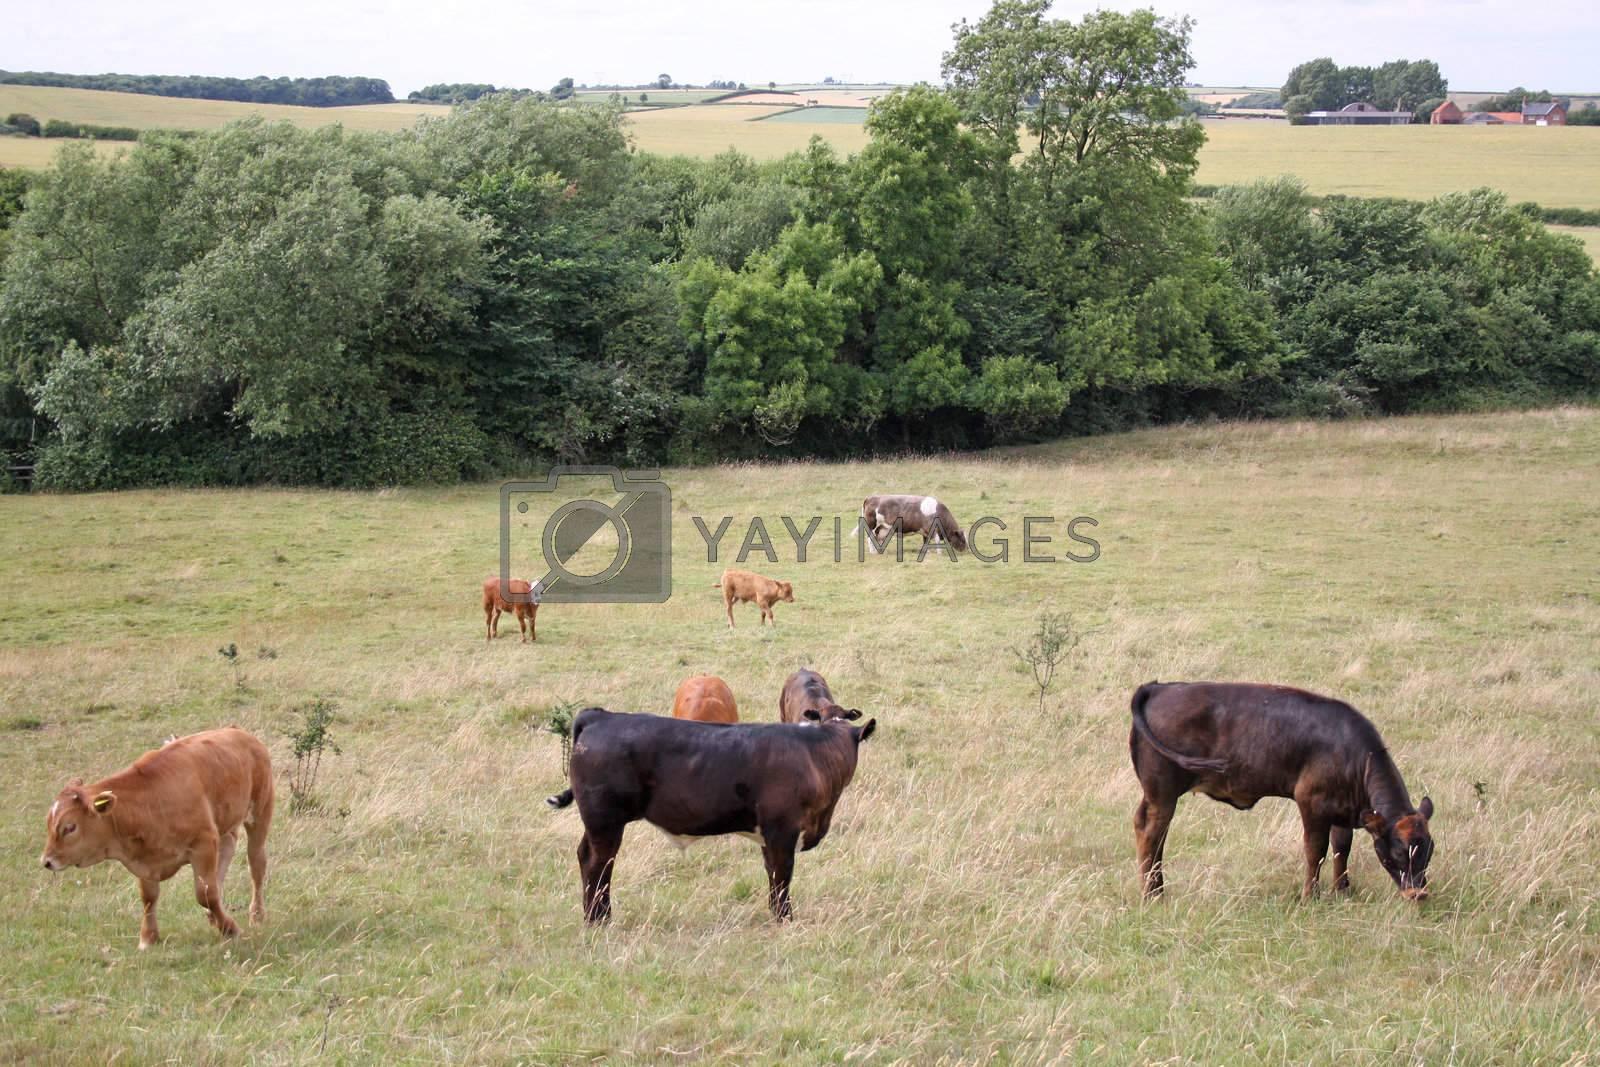 a cow grazing in a field